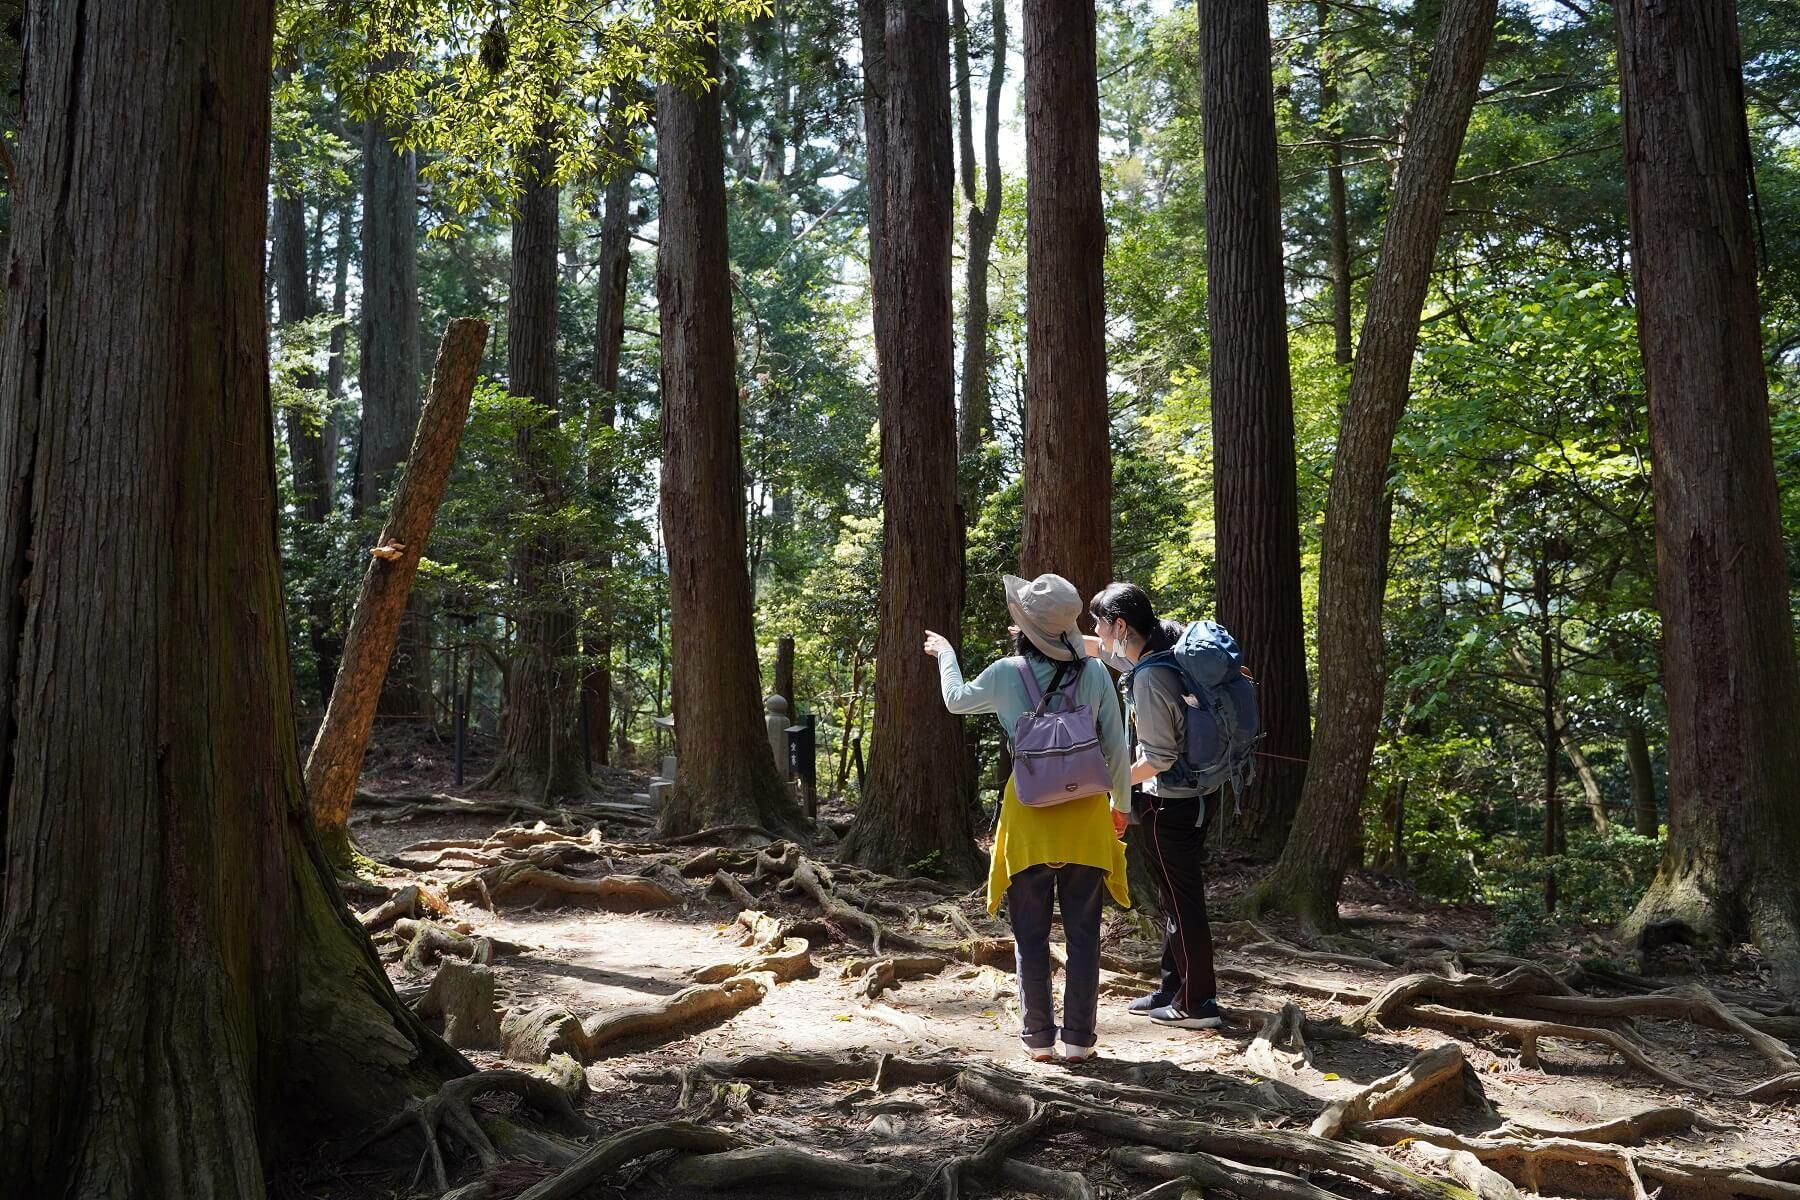 【NATURE TOUR】京都一周トレイル:⑥大原〜貴船コース《5月》